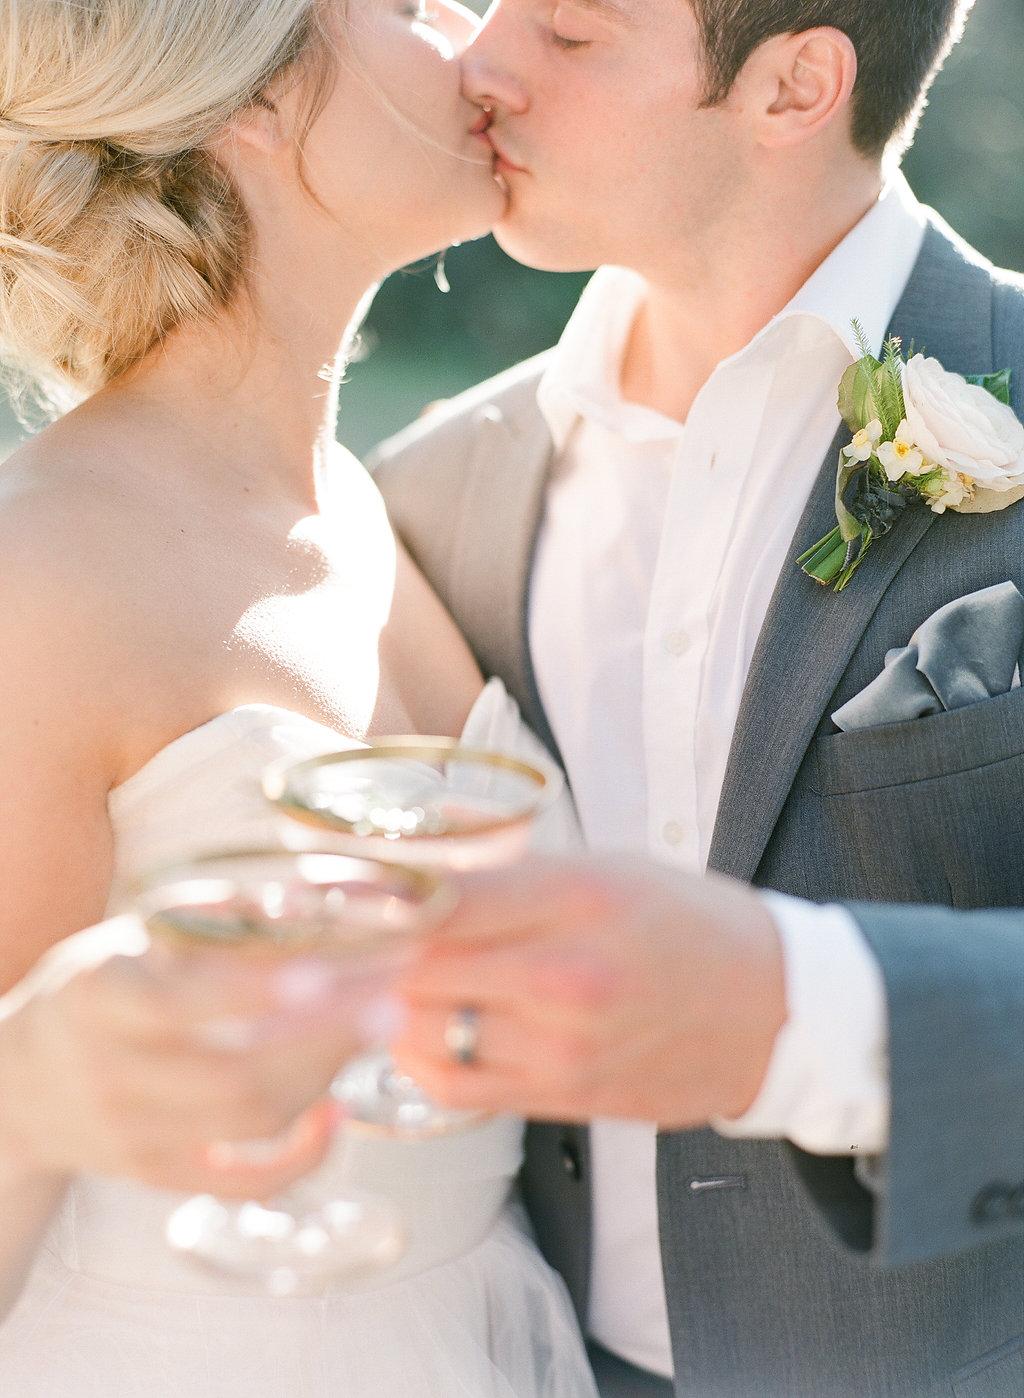 the-happy-bloom-wormsloe-wedding-savannah-wedding-ivory-and-beau-bridal-boutique-savannah-wedding-dresses-savannah-bridal-boutique-georgia-bridal-boutique-design-studio-south-sunset-wedding-blush-by-hayley-paige-candi-1550-blush-wedding-dress-13.jpg